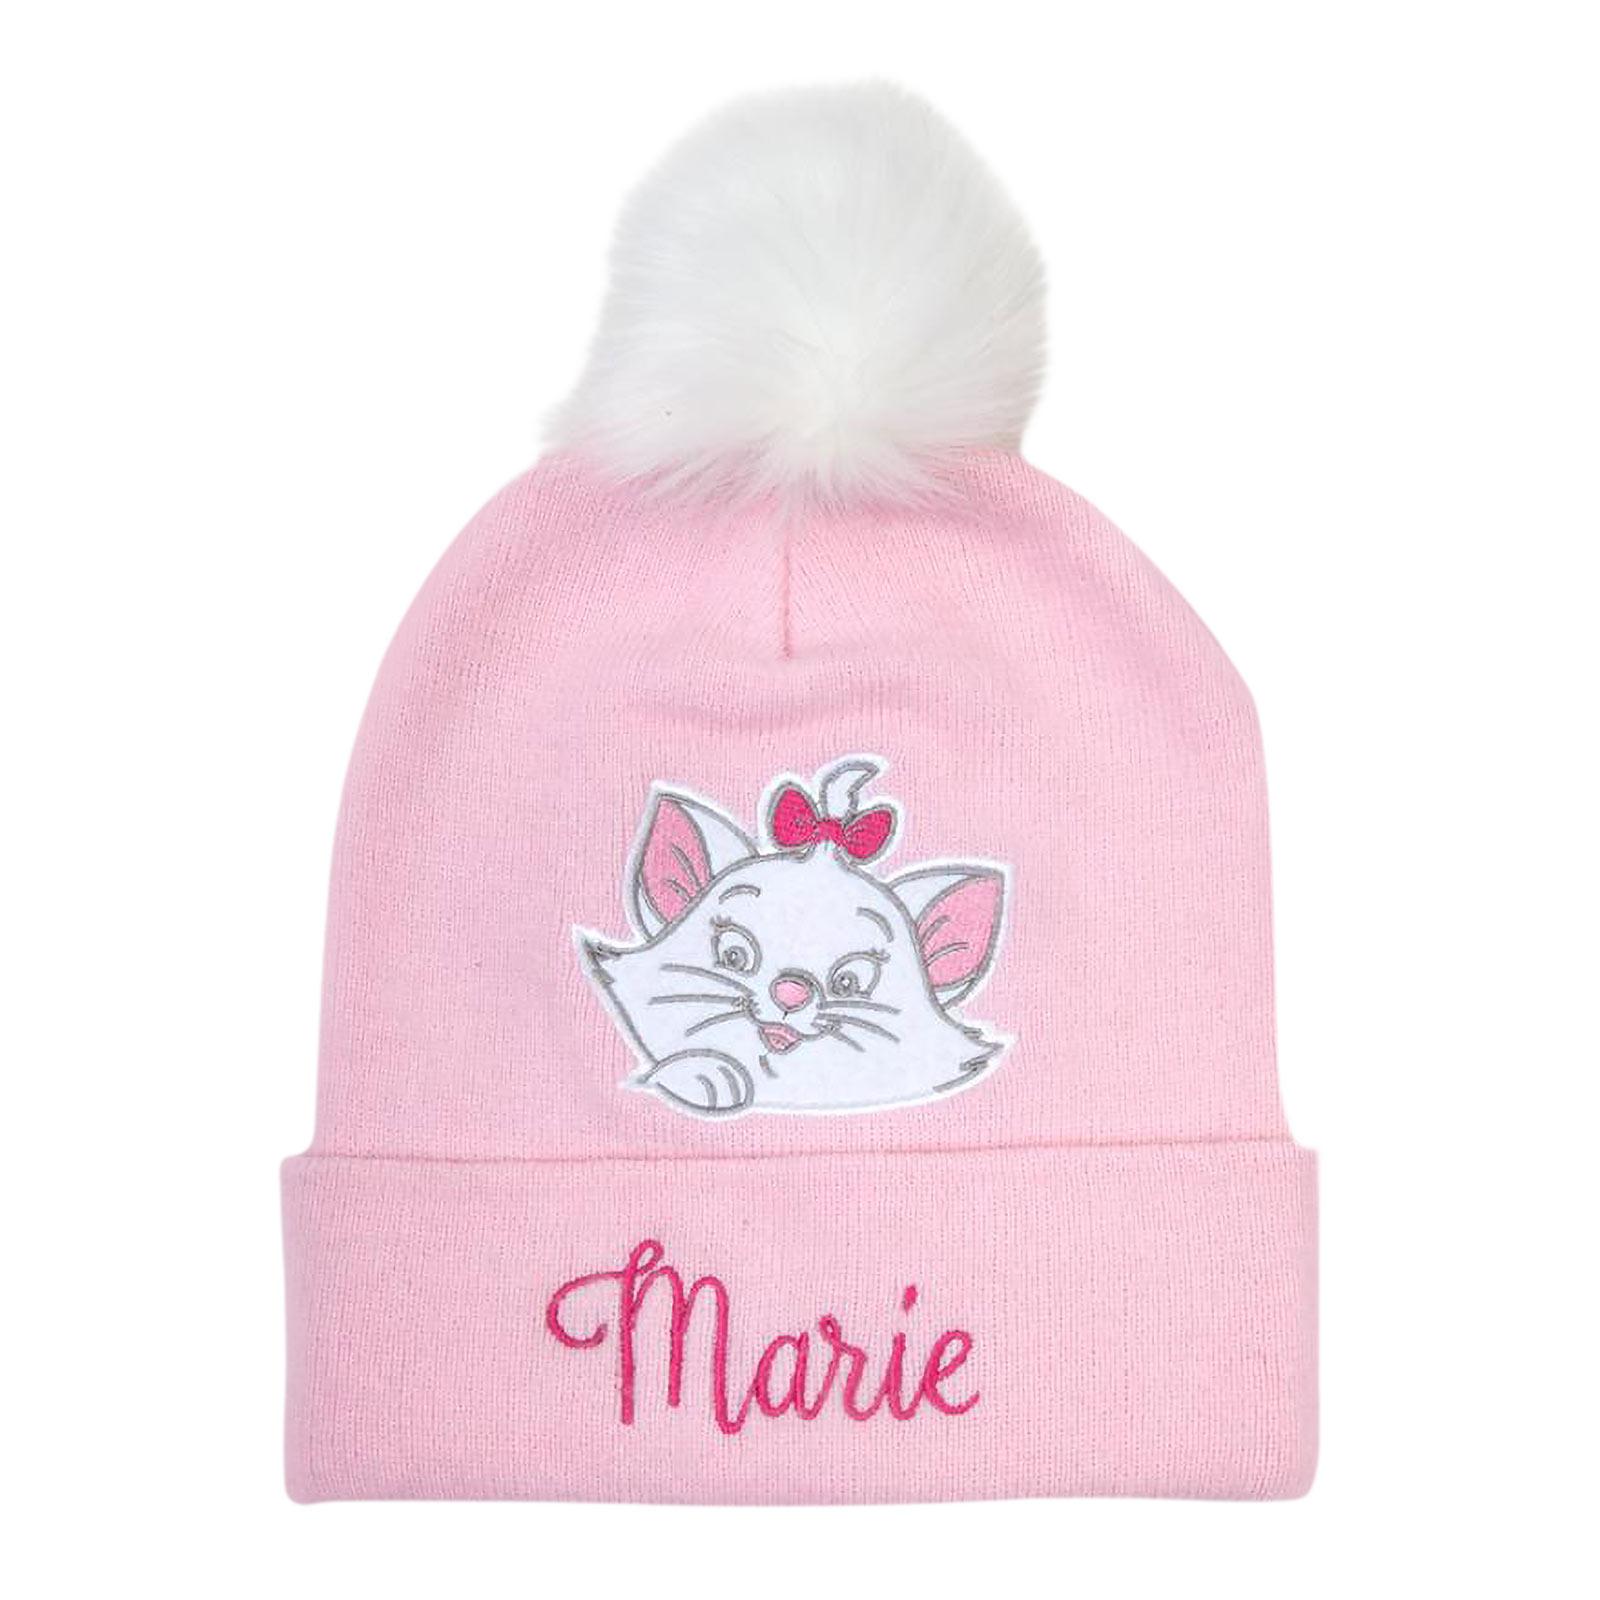 Aristocats - Marie Mütze rosa